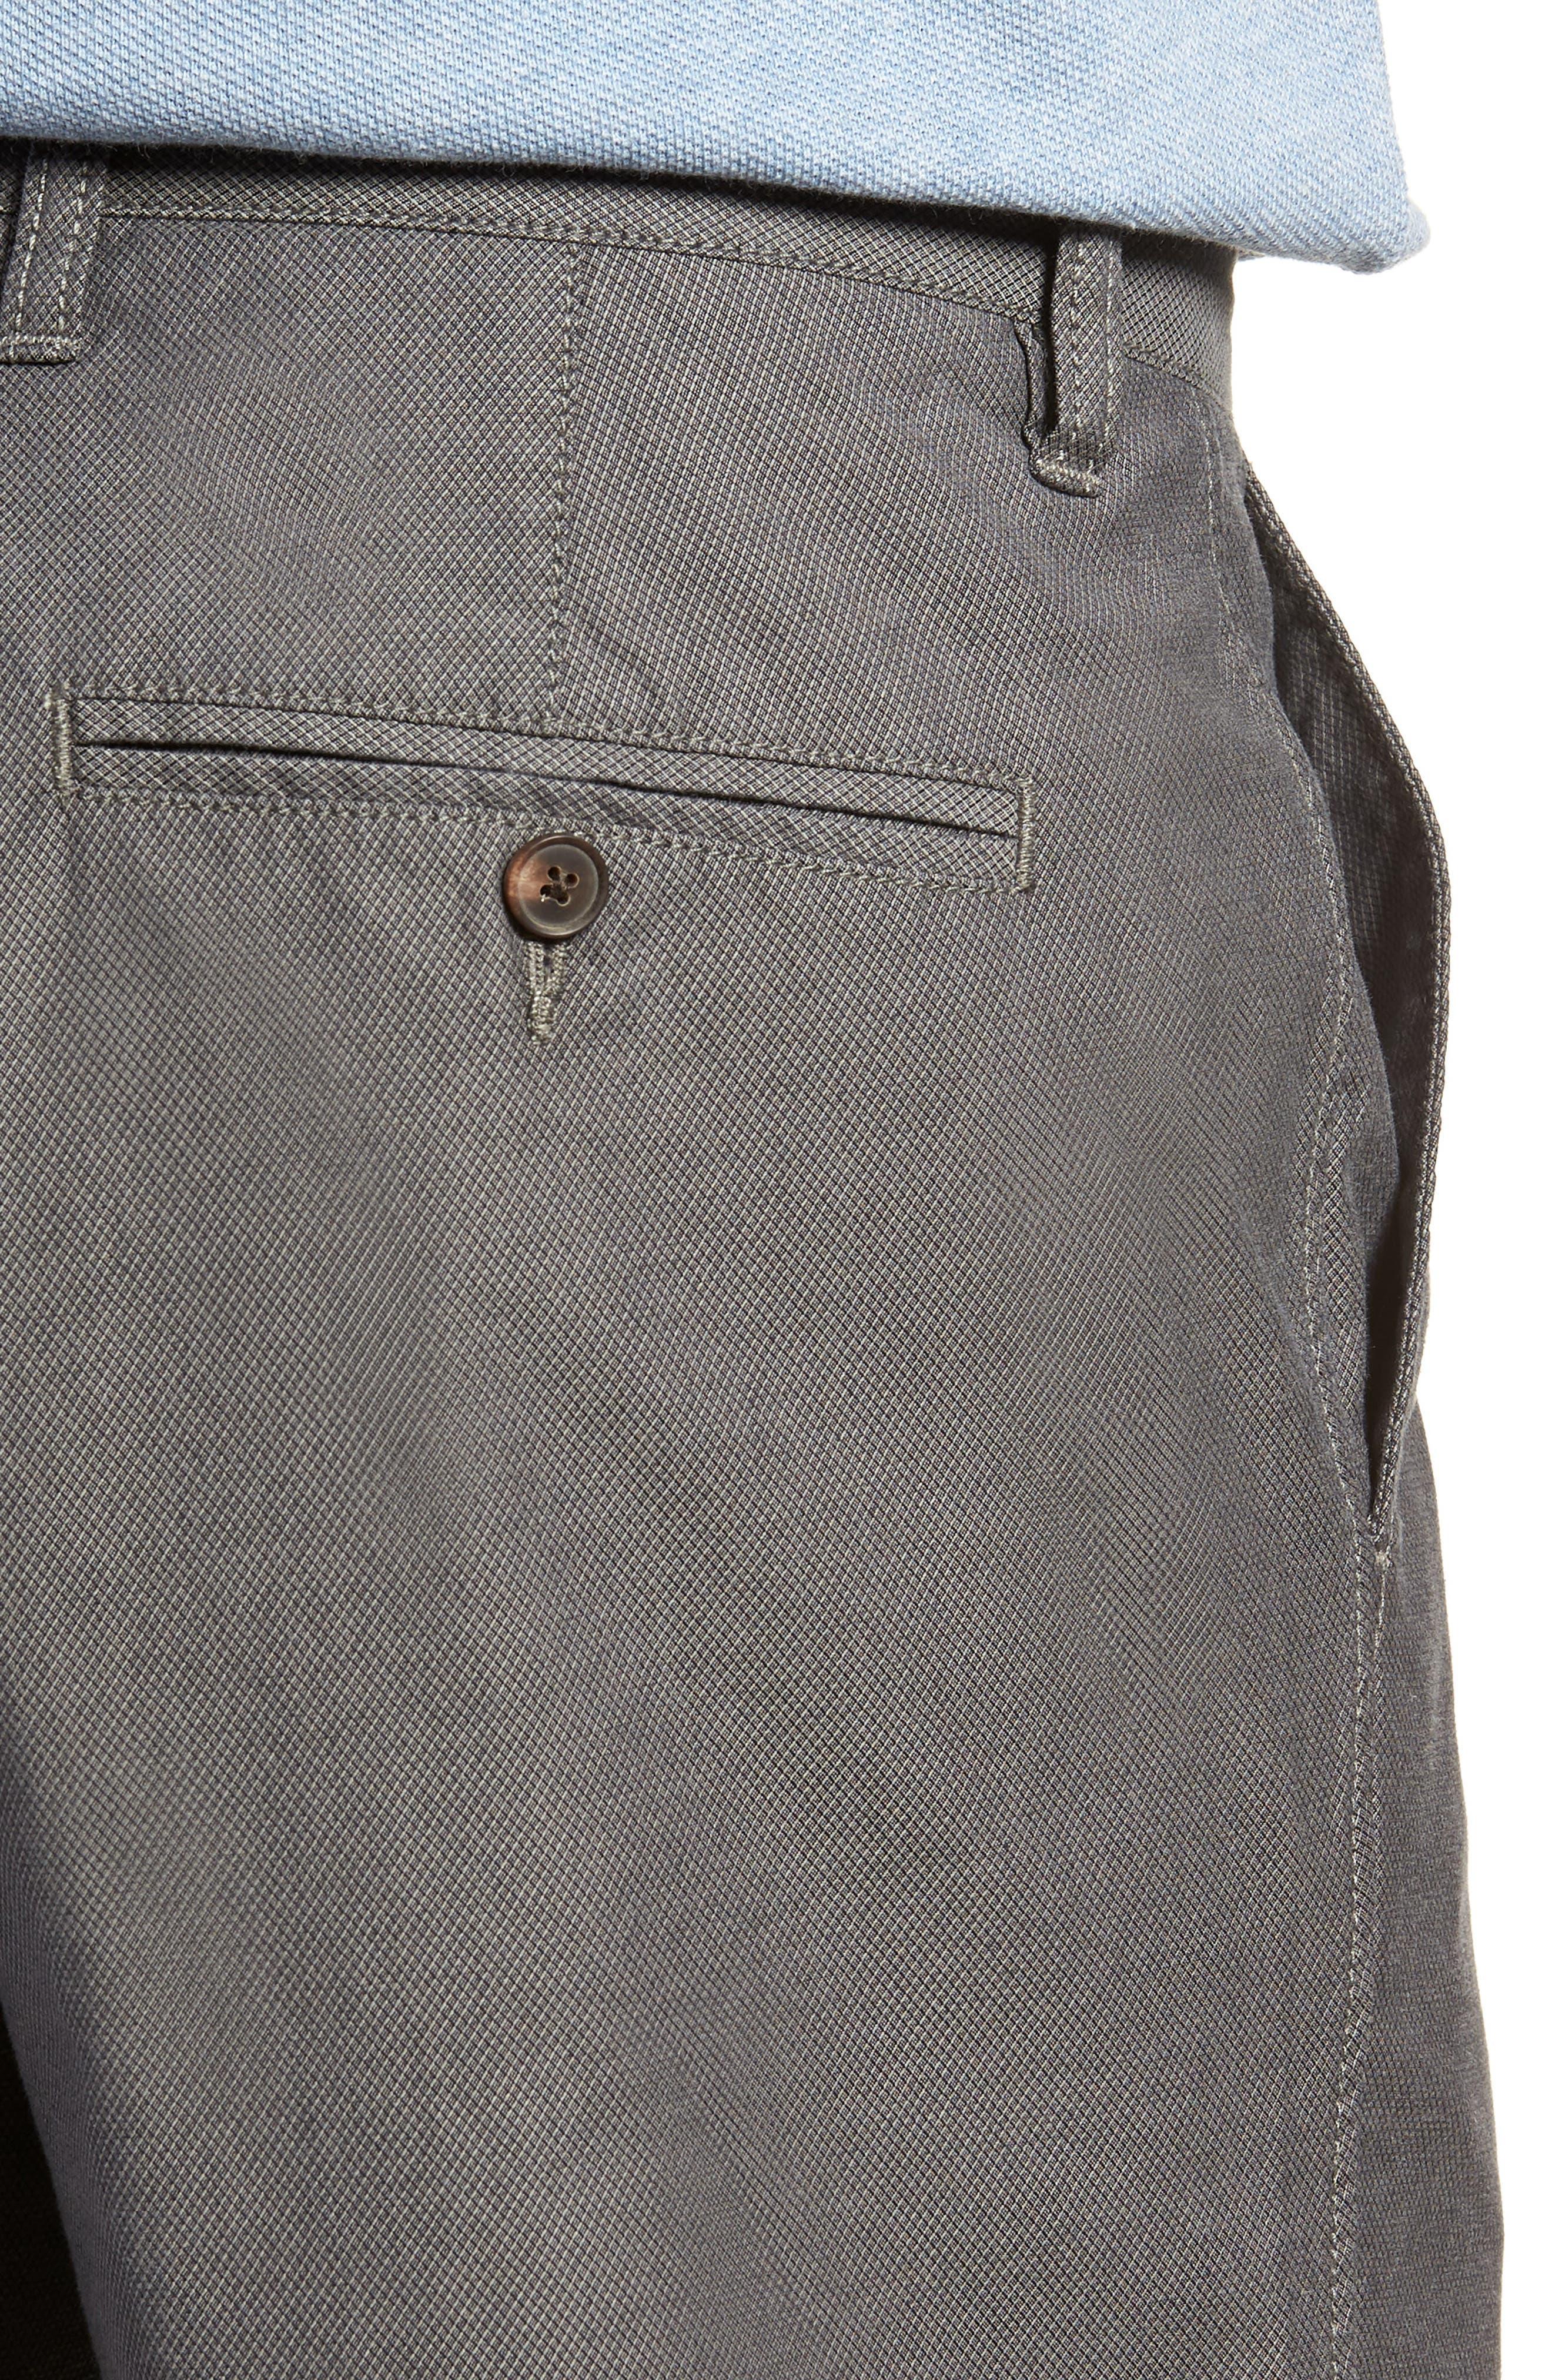 Army Bay Regular Fit Shorts,                             Alternate thumbnail 4, color,                             Granite